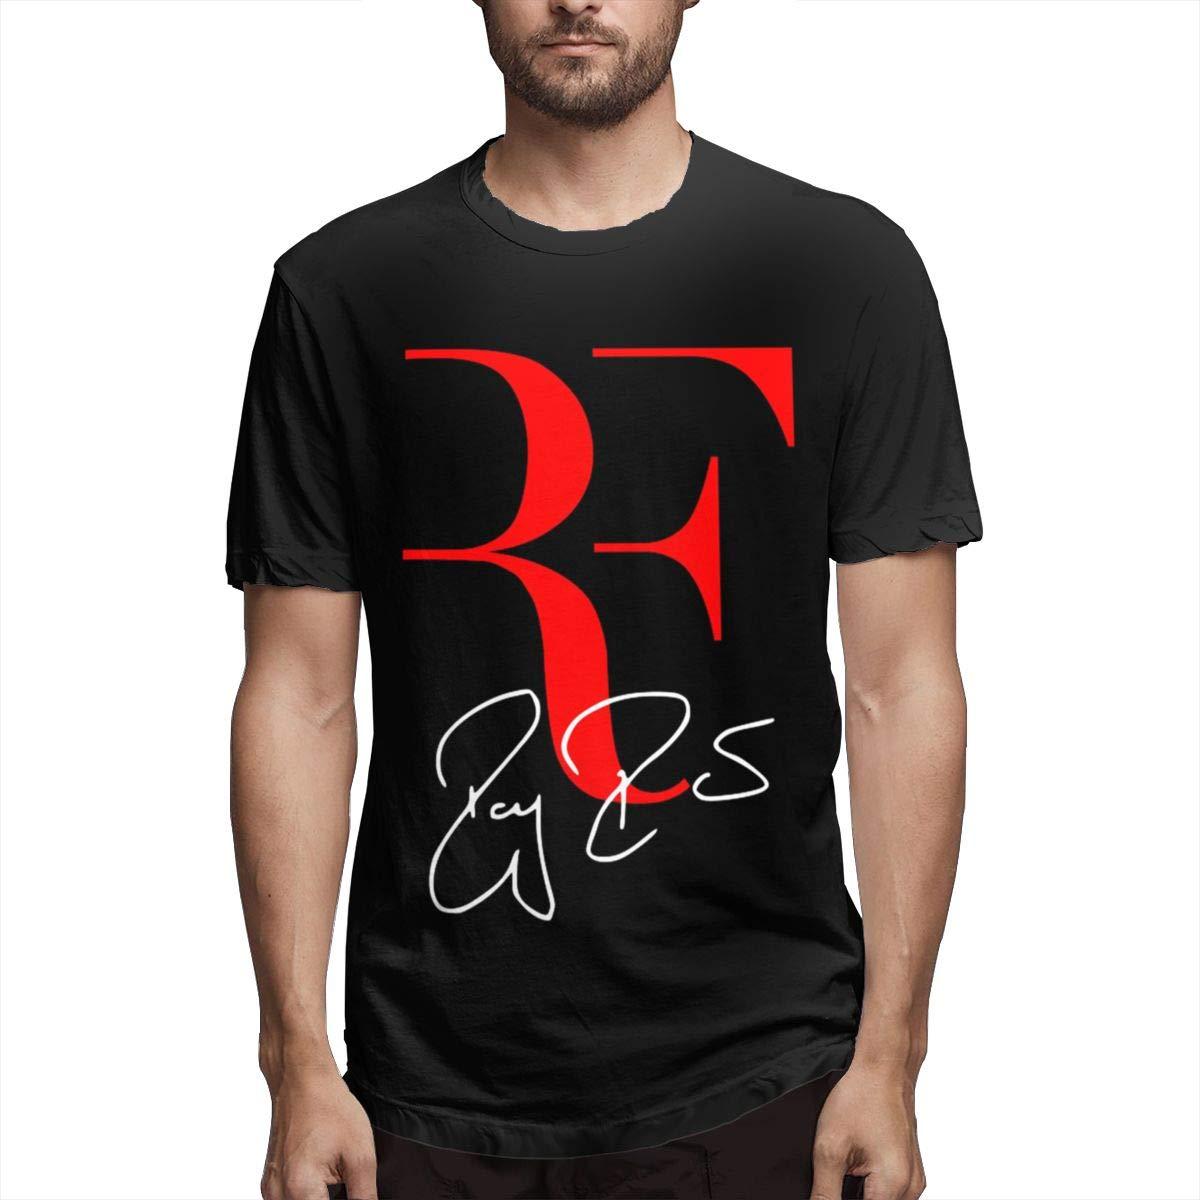 LANBRELLA Men Roger Federer Crew Neck Short Sleeve T Shirts M Black